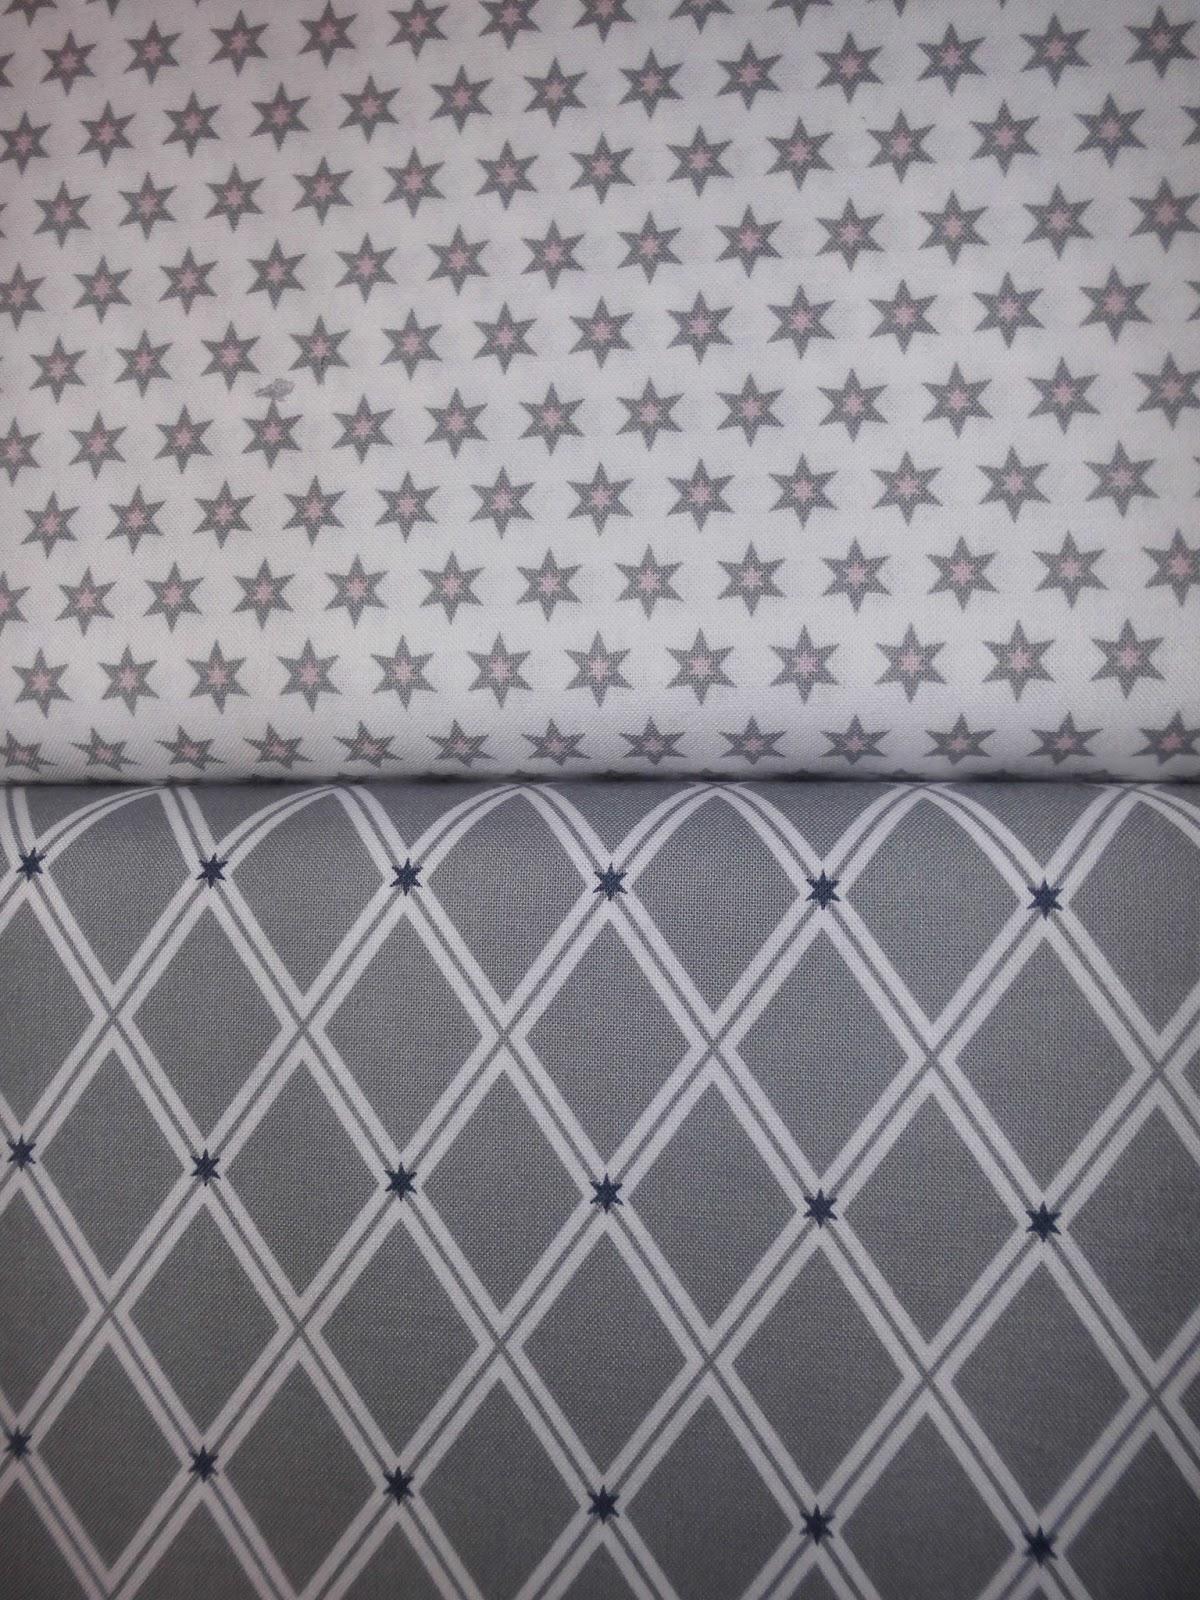 femilist graue g termannstoffe wieder aufgef llt. Black Bedroom Furniture Sets. Home Design Ideas